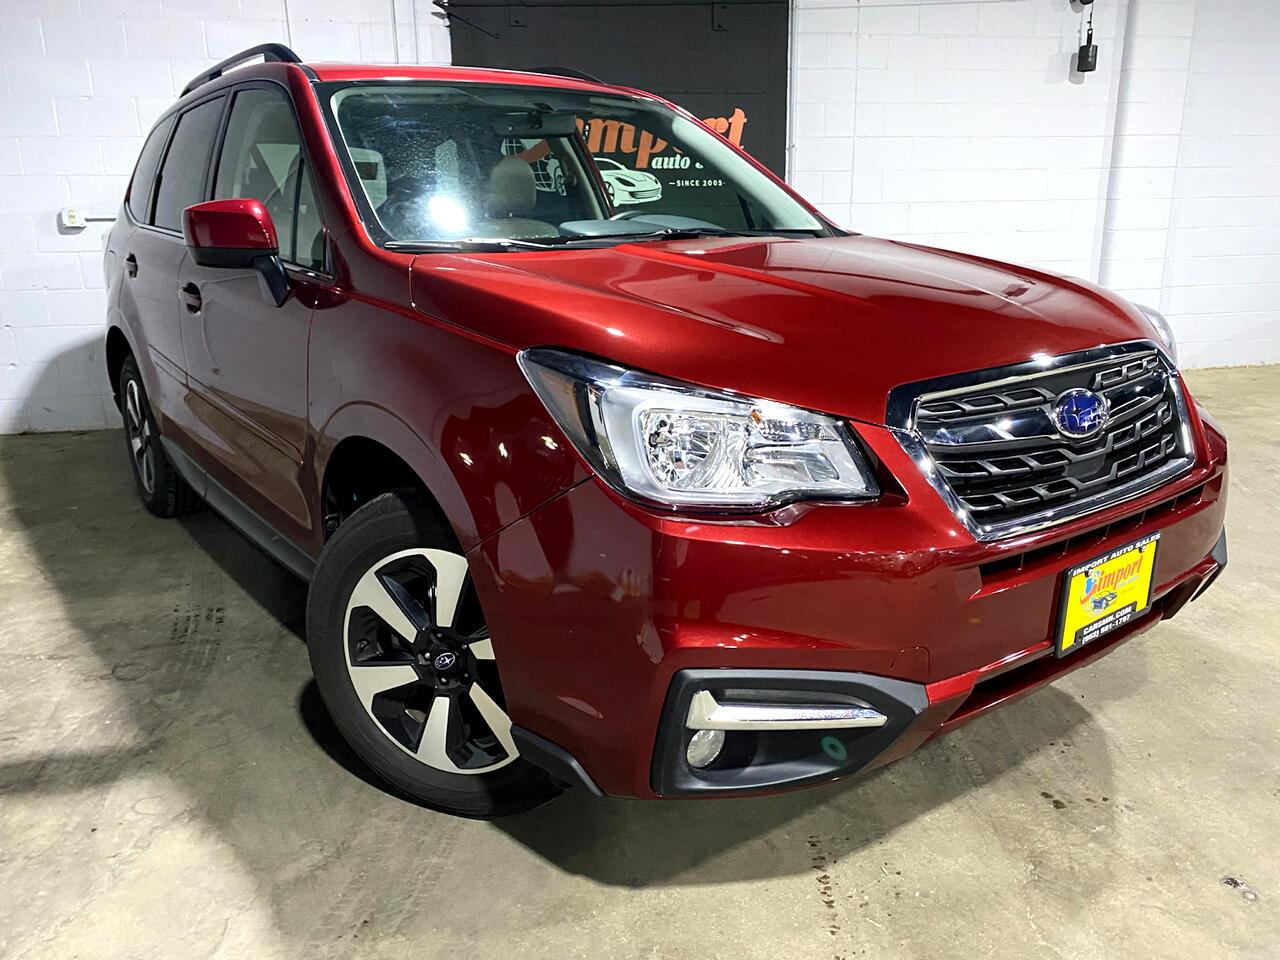 Subaru Forester 2.5i Limited CVT 2018